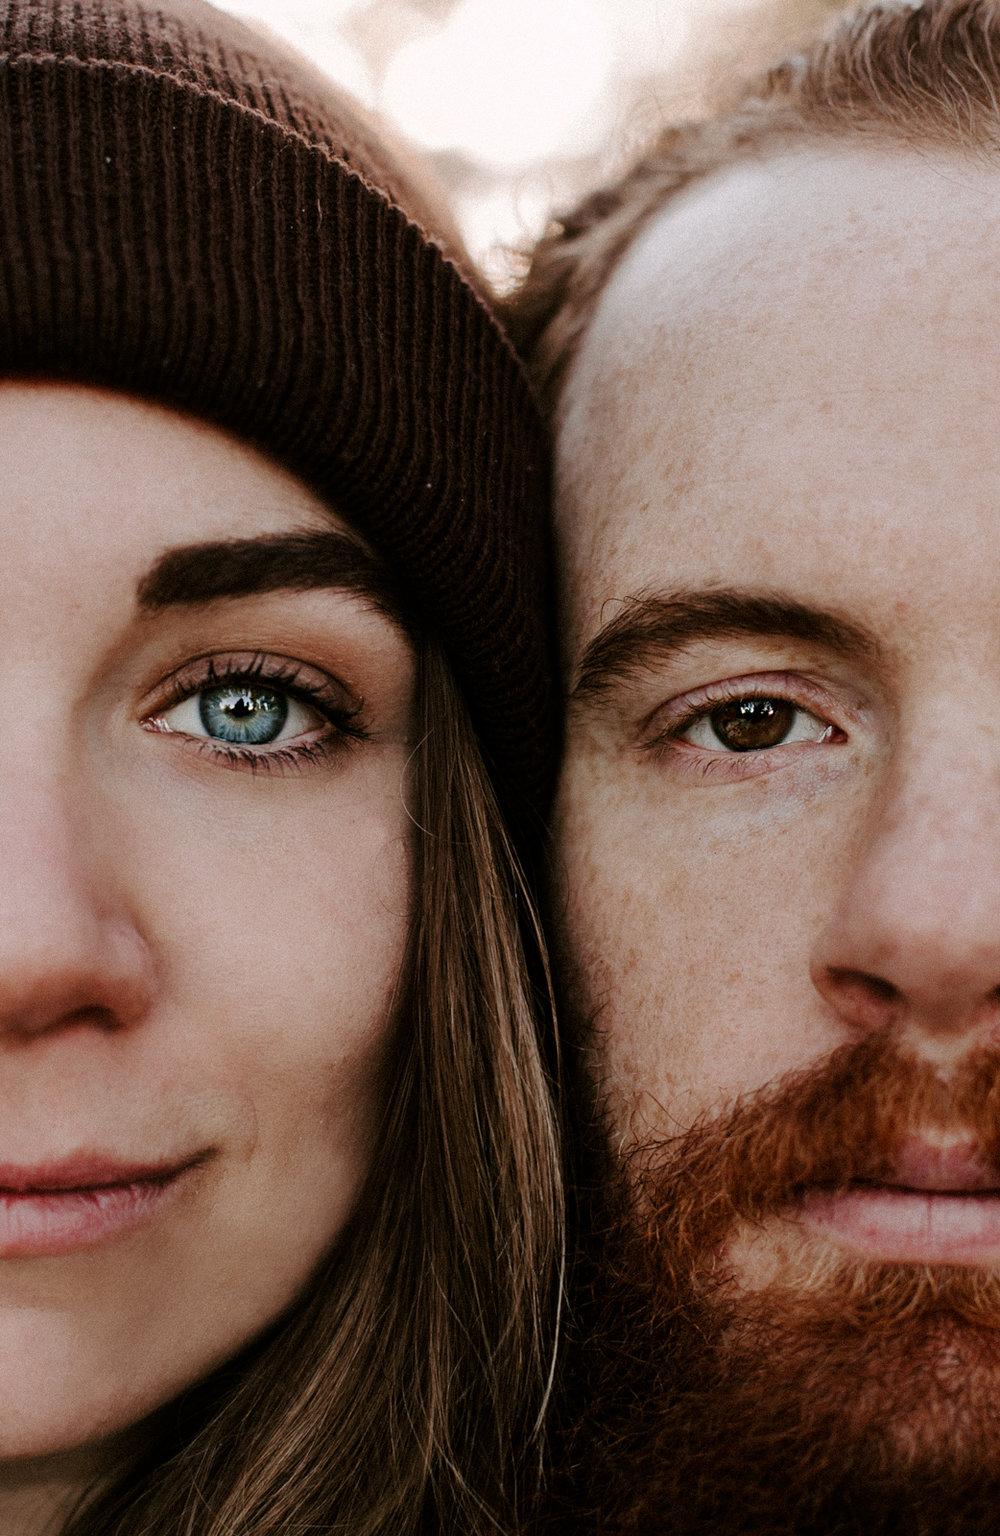 Heather & Joshua Colorado Couples Engagement Mountain Outdoor Session-78.jpg